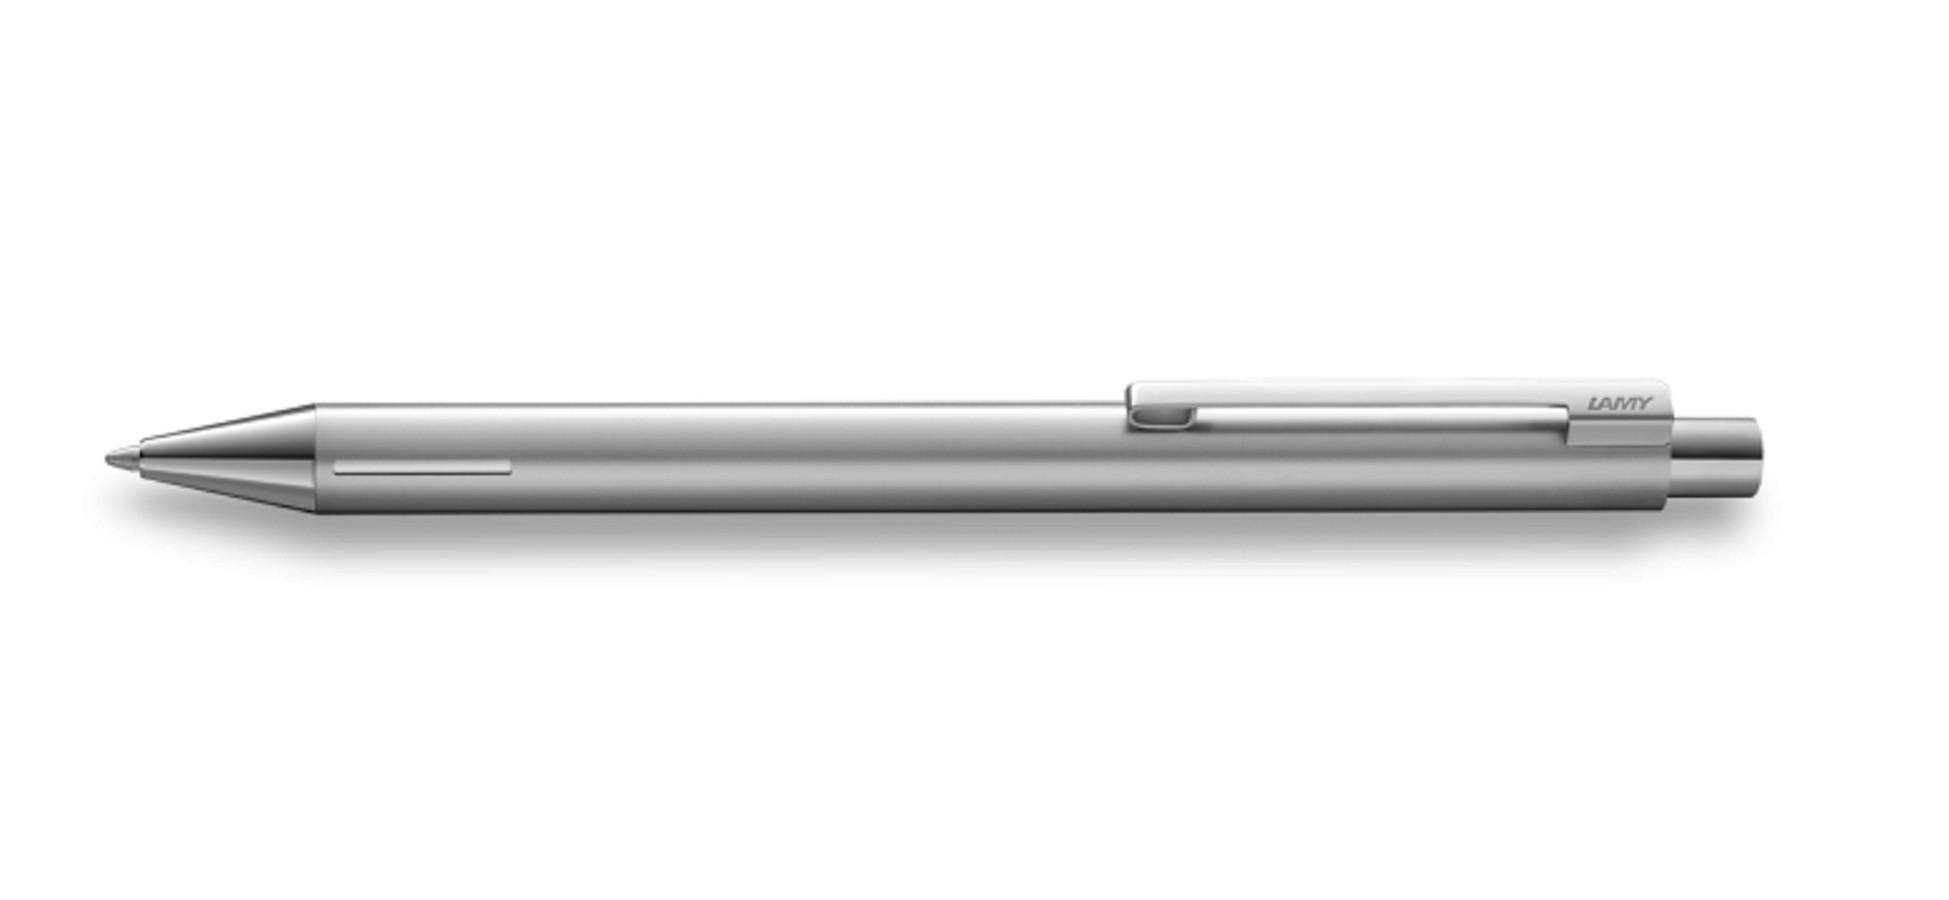 Viết Lamy Econ 4000924 - Stainless Steel